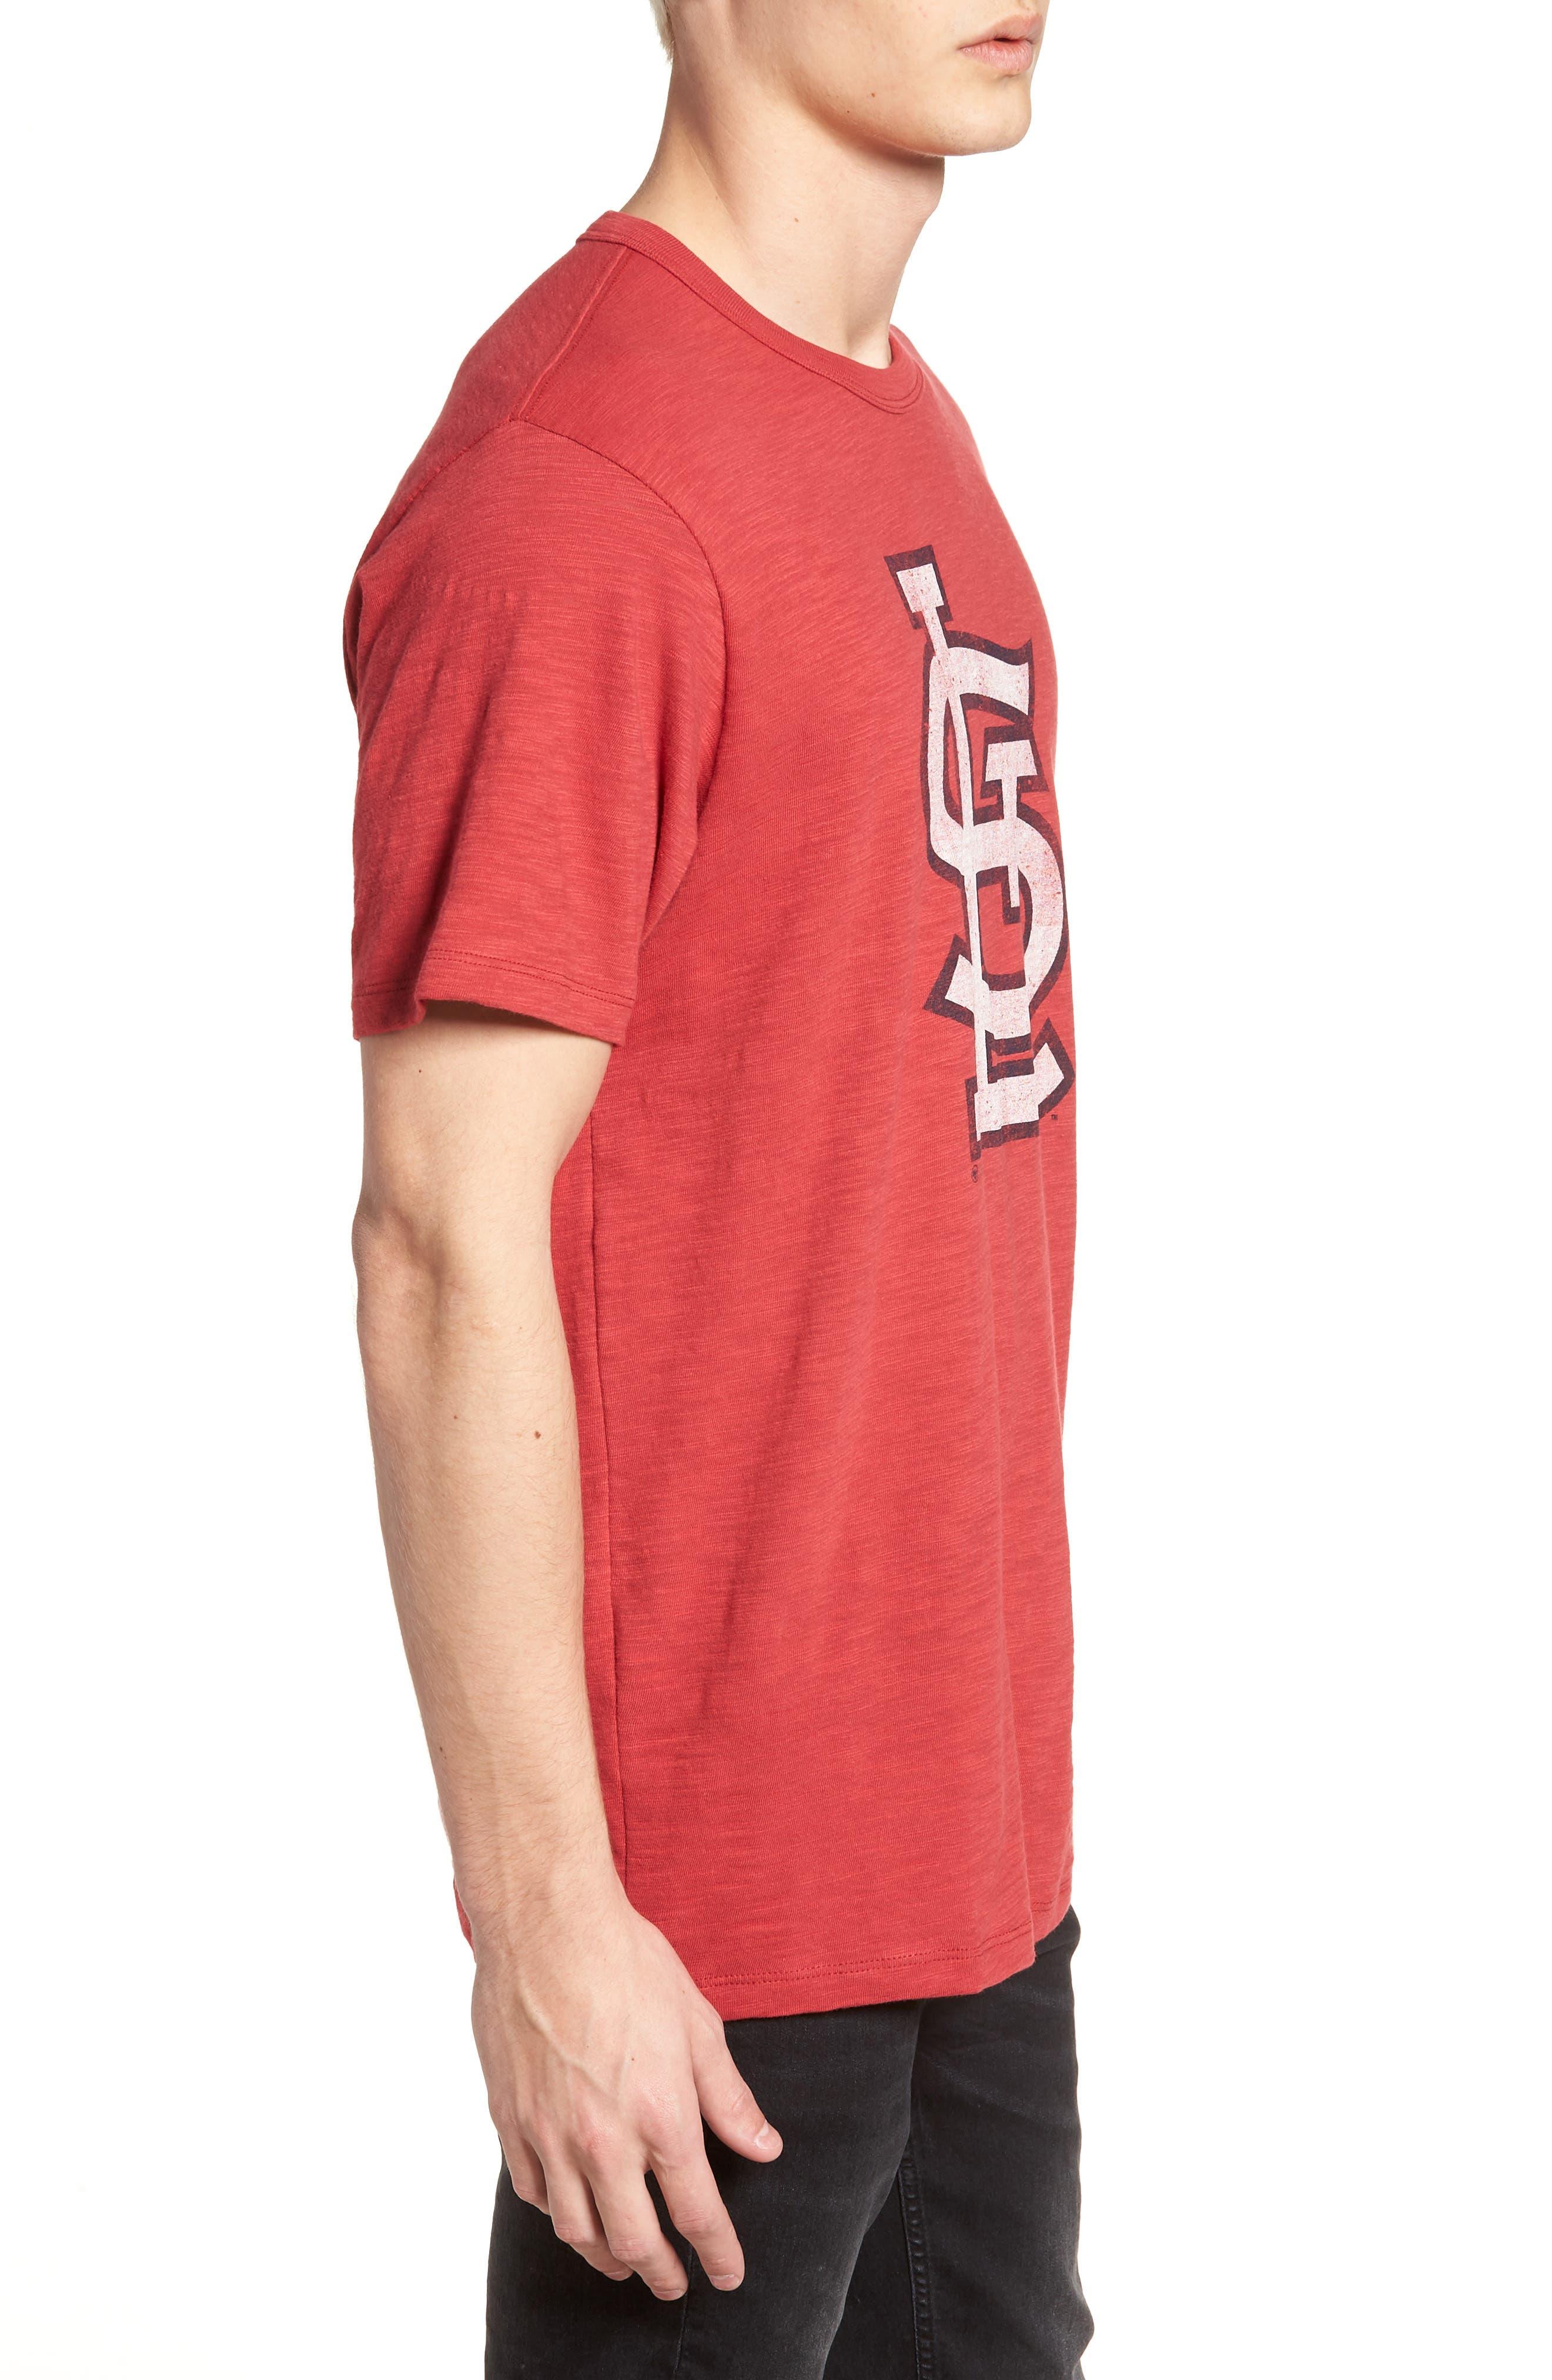 Grit Scrum St. Louis Cardinals T-Shirt,                             Alternate thumbnail 3, color,                             Rescue Red